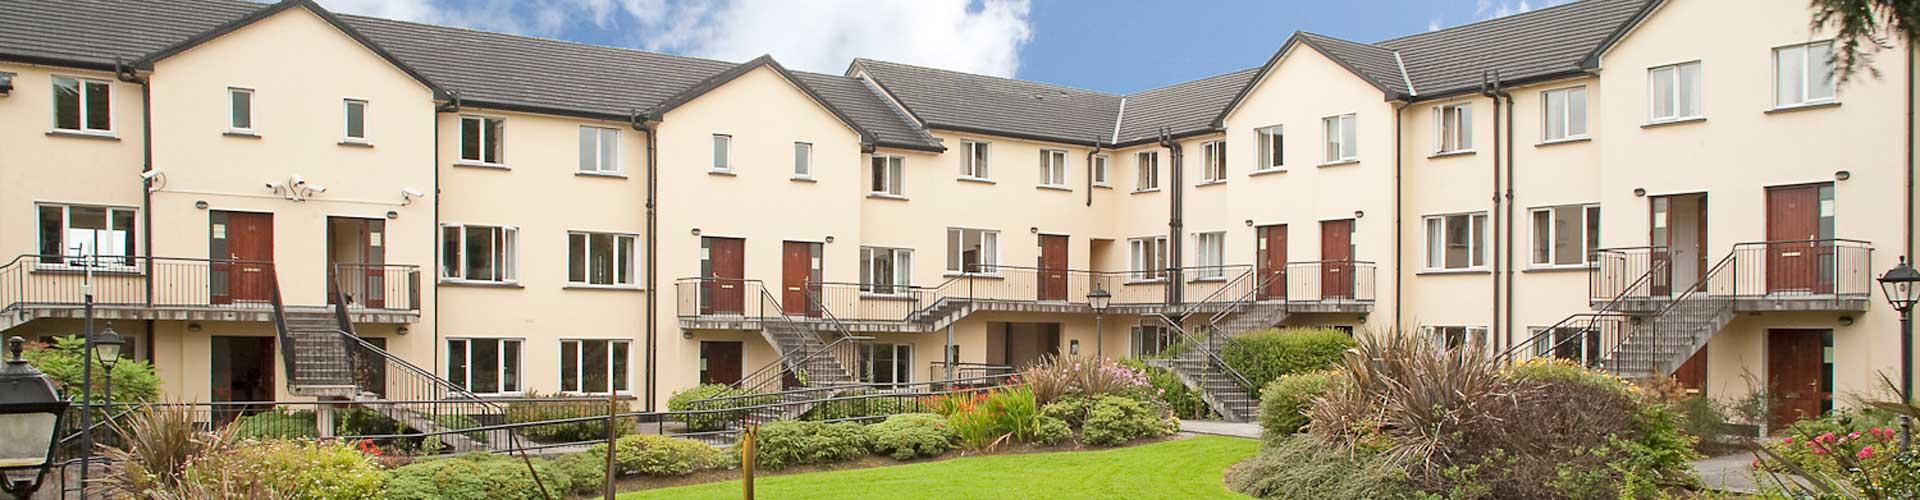 Menlo Park Apartments Galway City Family Breaks Galway Self